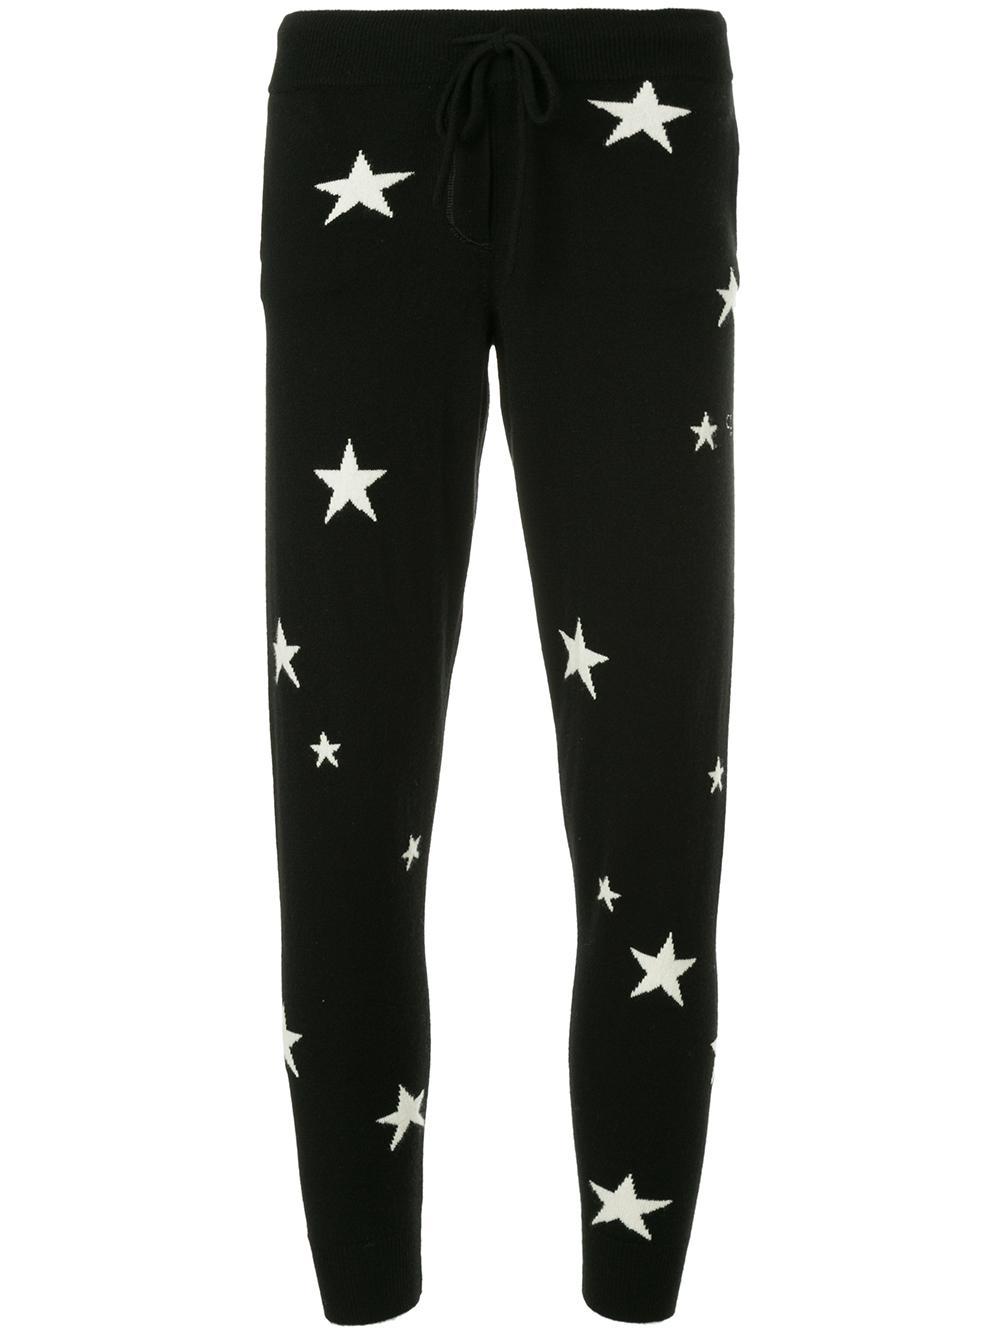 Star Track Pant